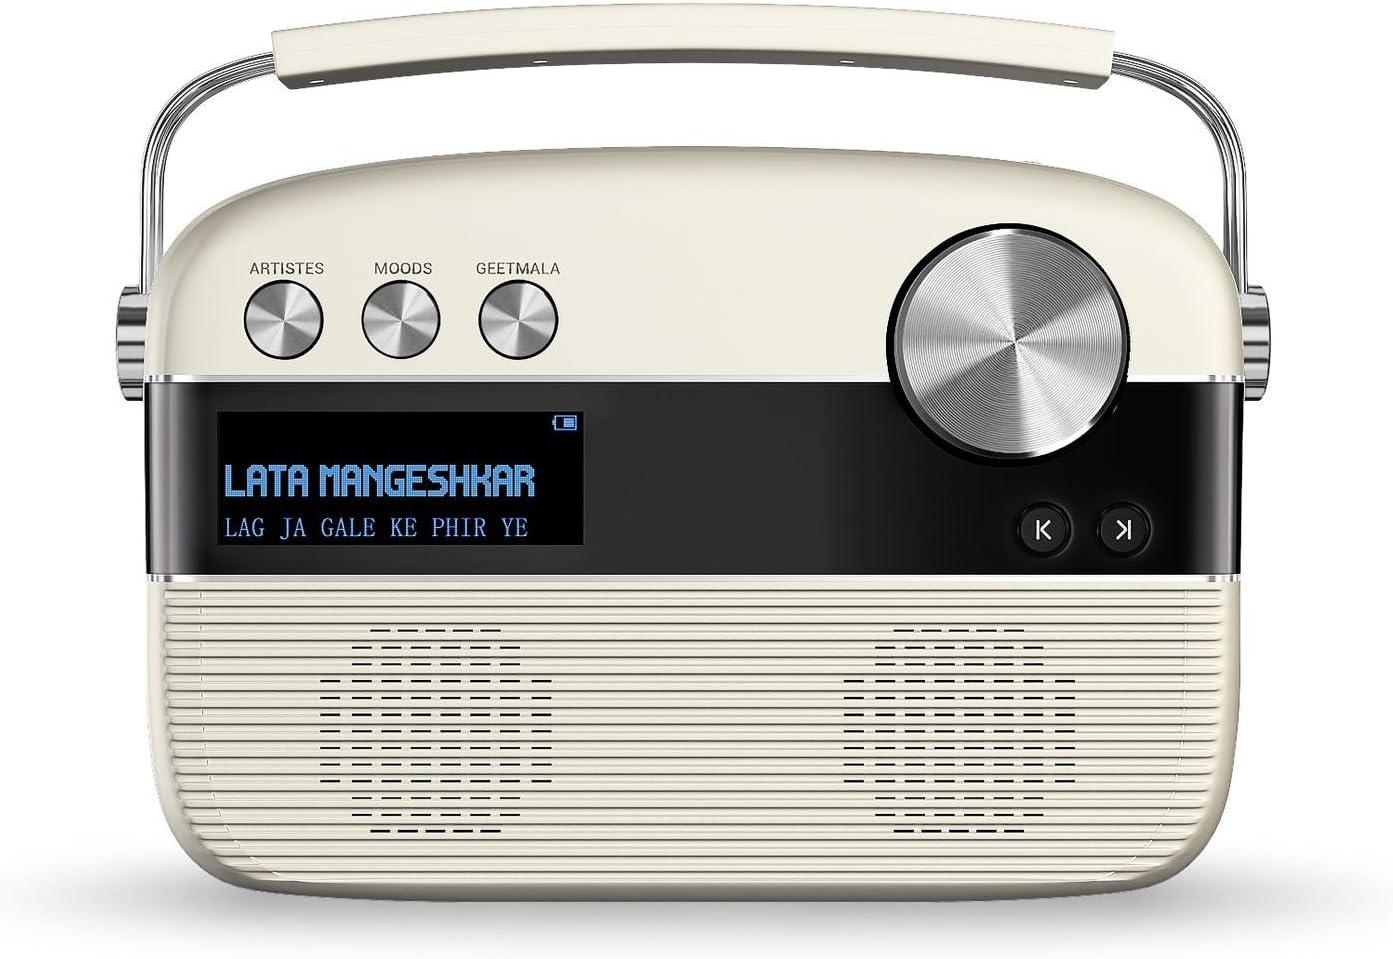 Saregama Carvaan Portable Digital Music Player Porcelain White